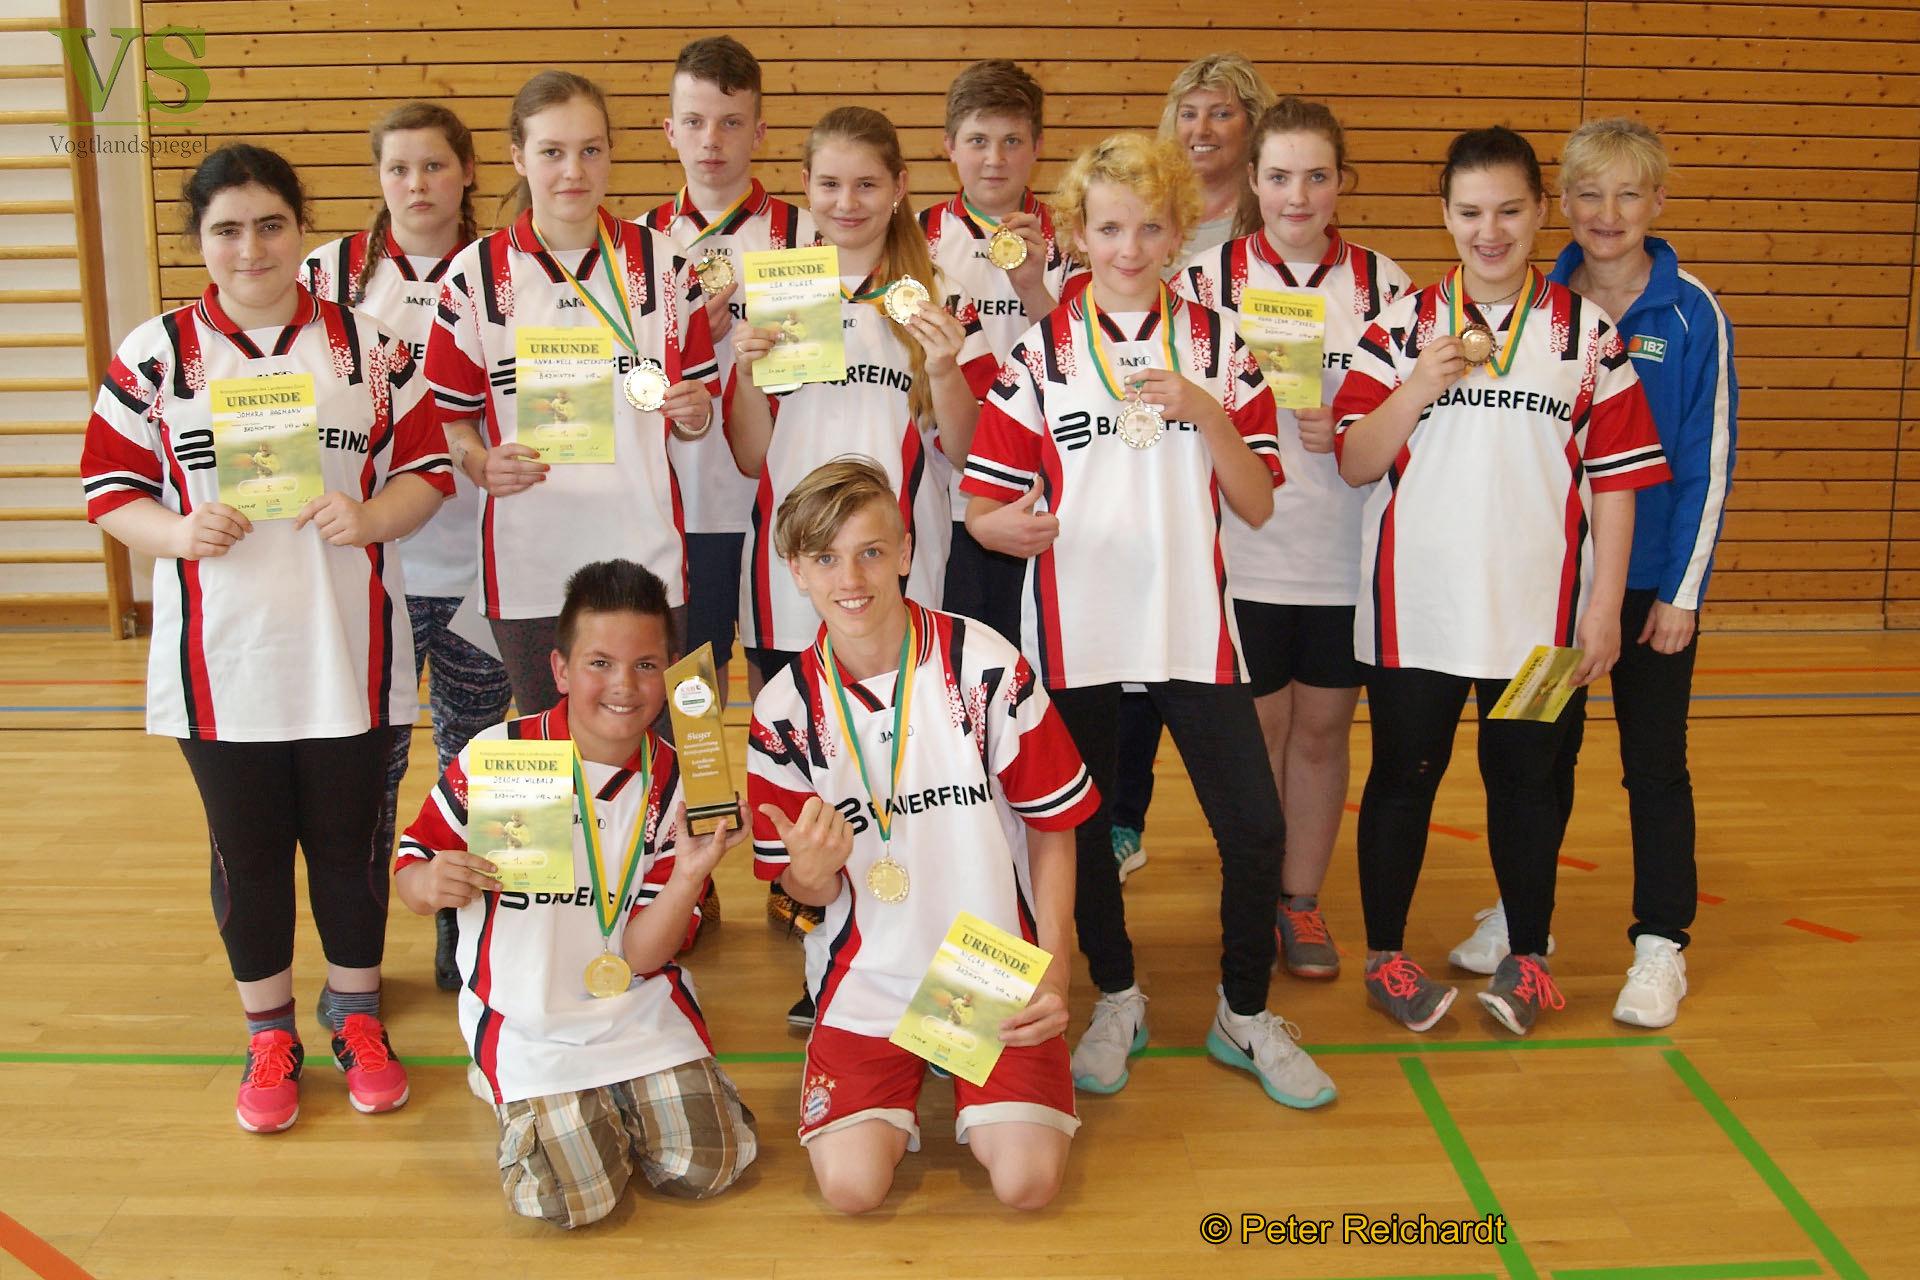 Kreisjugendspiele im Badminton: Schulmannschaft des Pestalozzi-Förderzentrums Zeulenroda holt sich den Wanderpokal